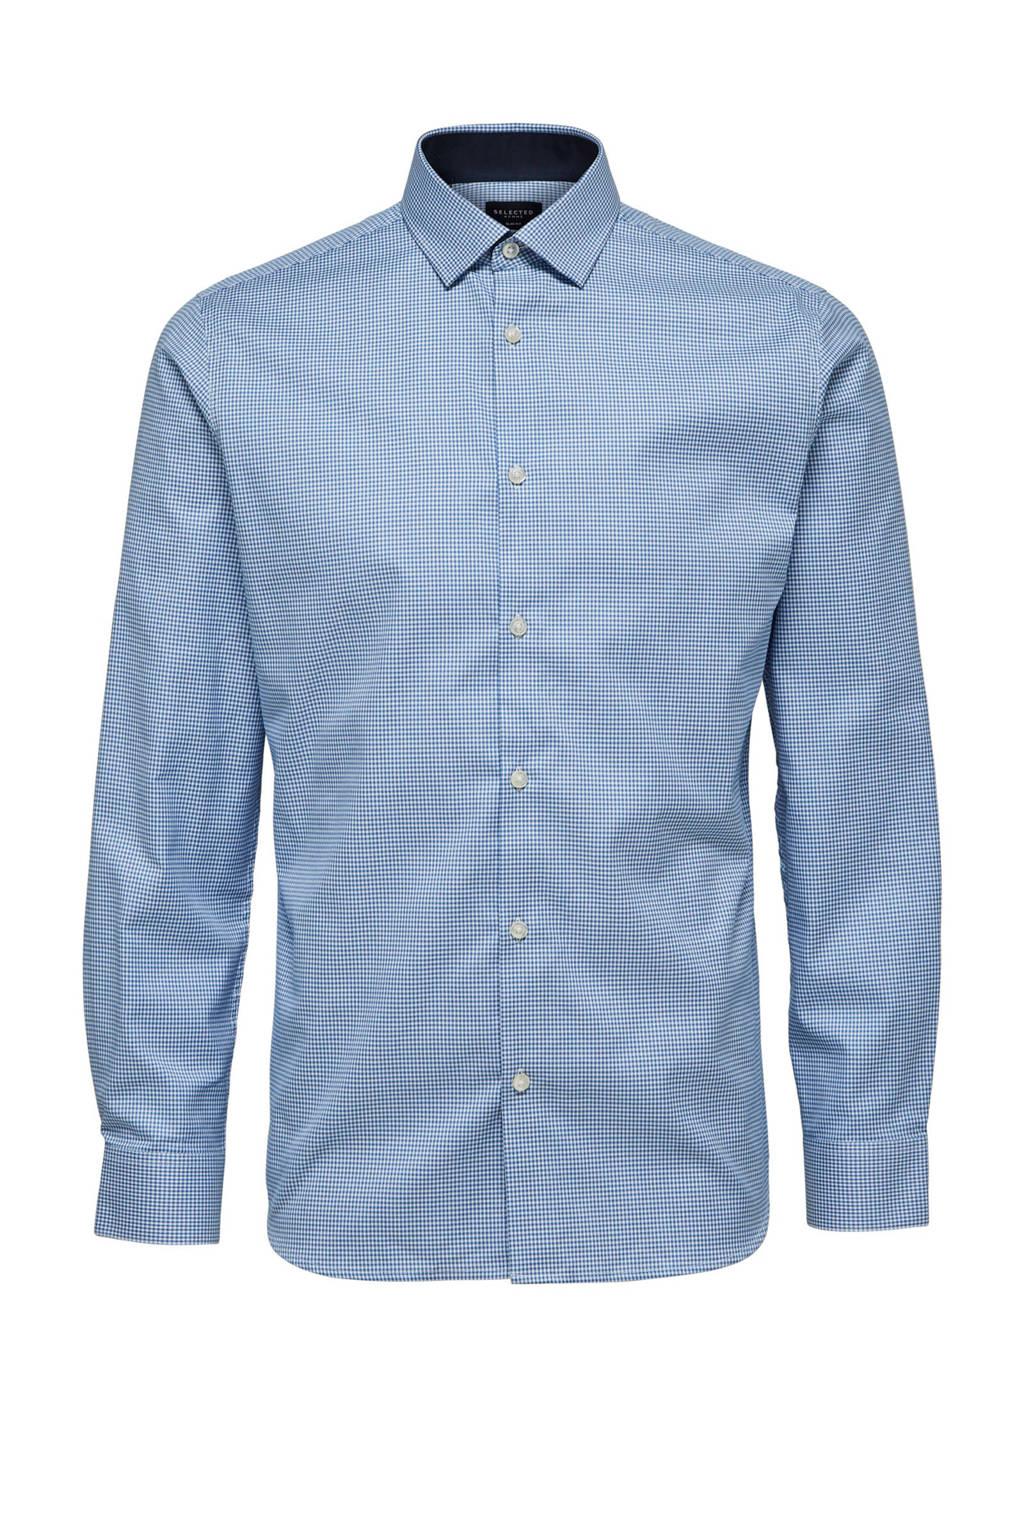 SELECTED HOMME New Mark slim fit overhemd, Blauw